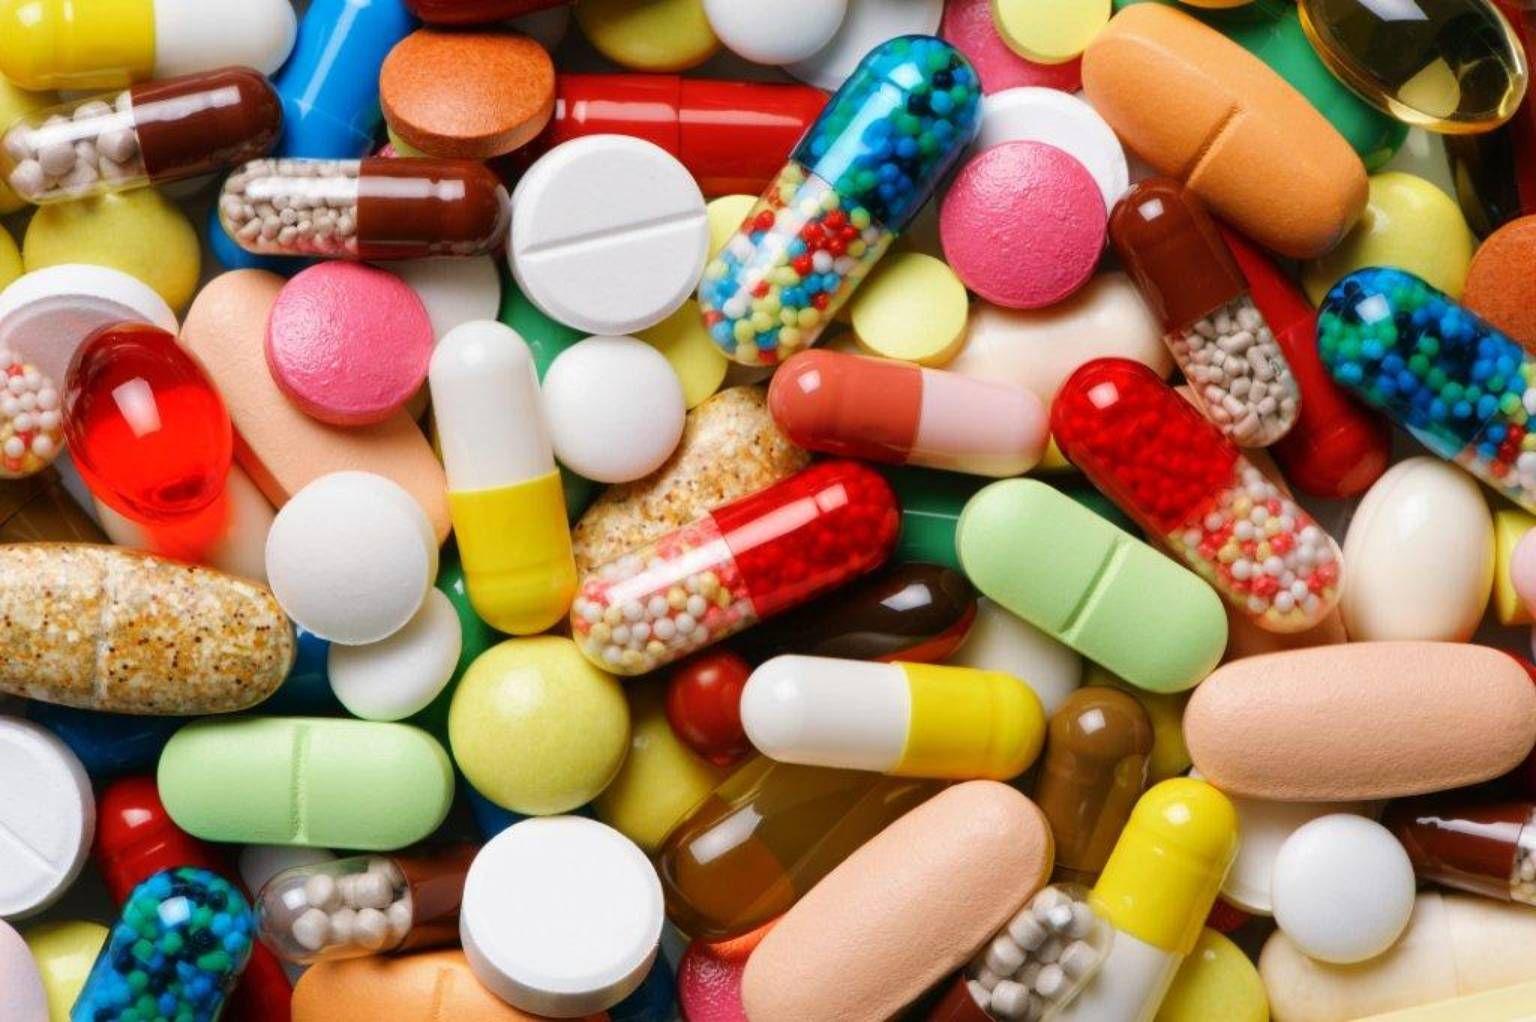 Картинки для аптеки таблетки